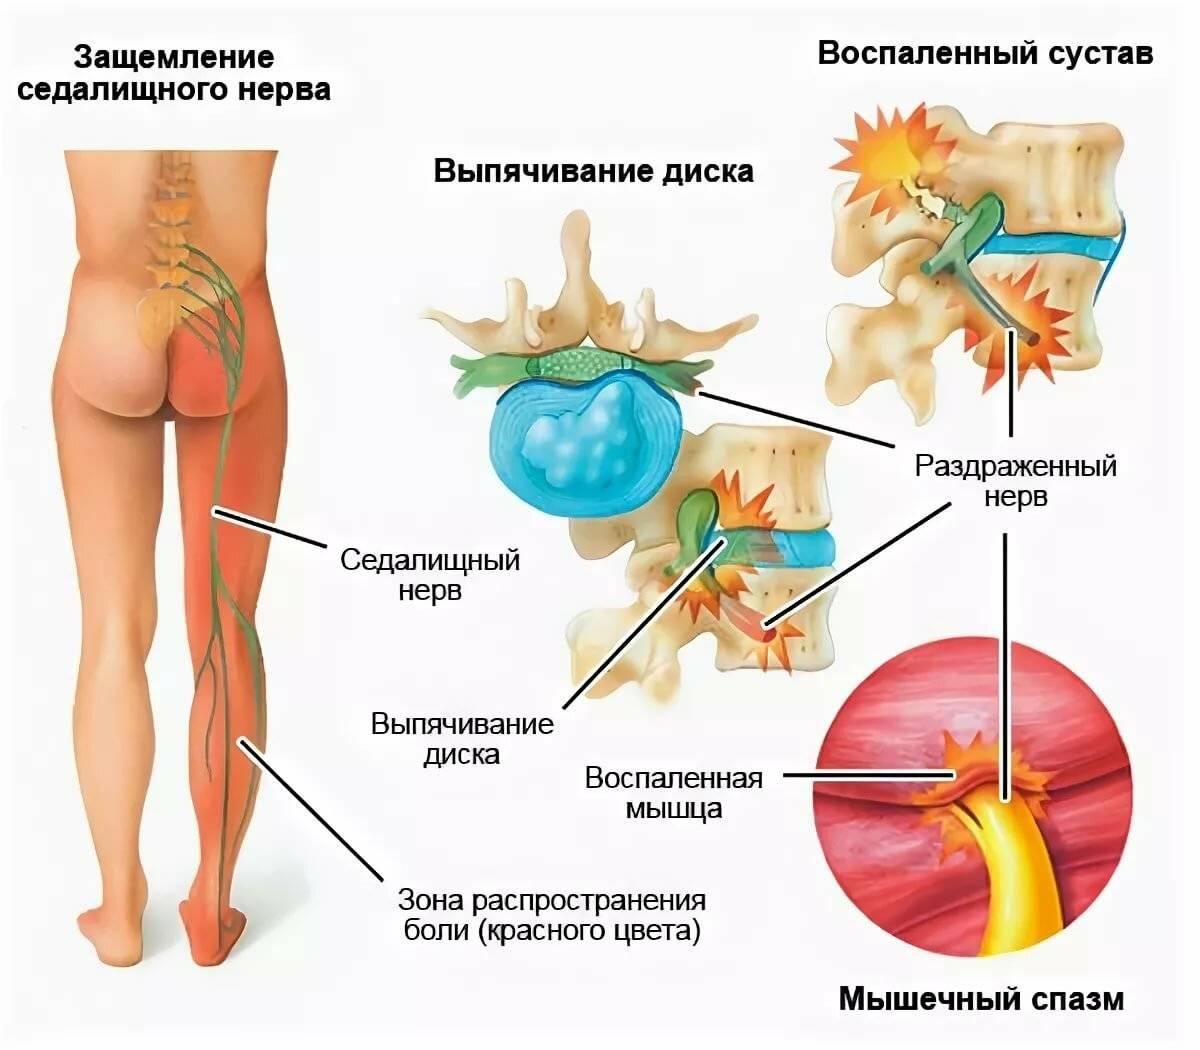 Лечение одышки при остеохондрозе